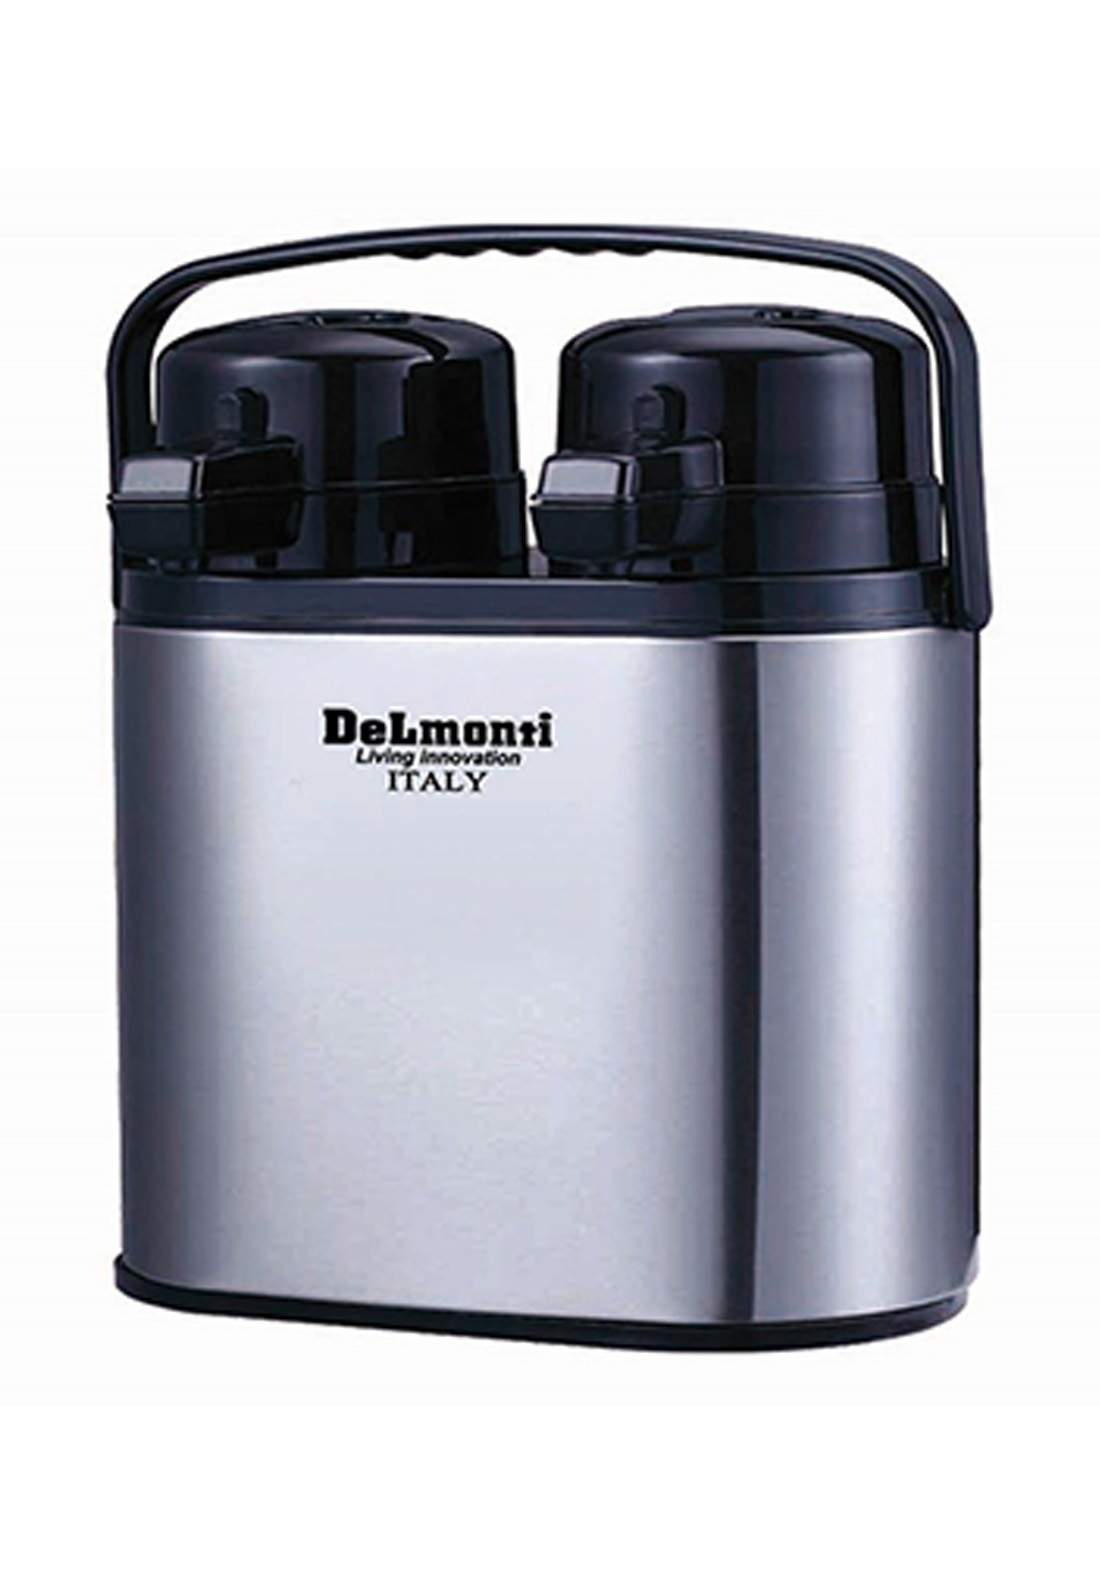 Delmonti   DL1450 Stainless steel twin air pot  3 L ترمز حراري